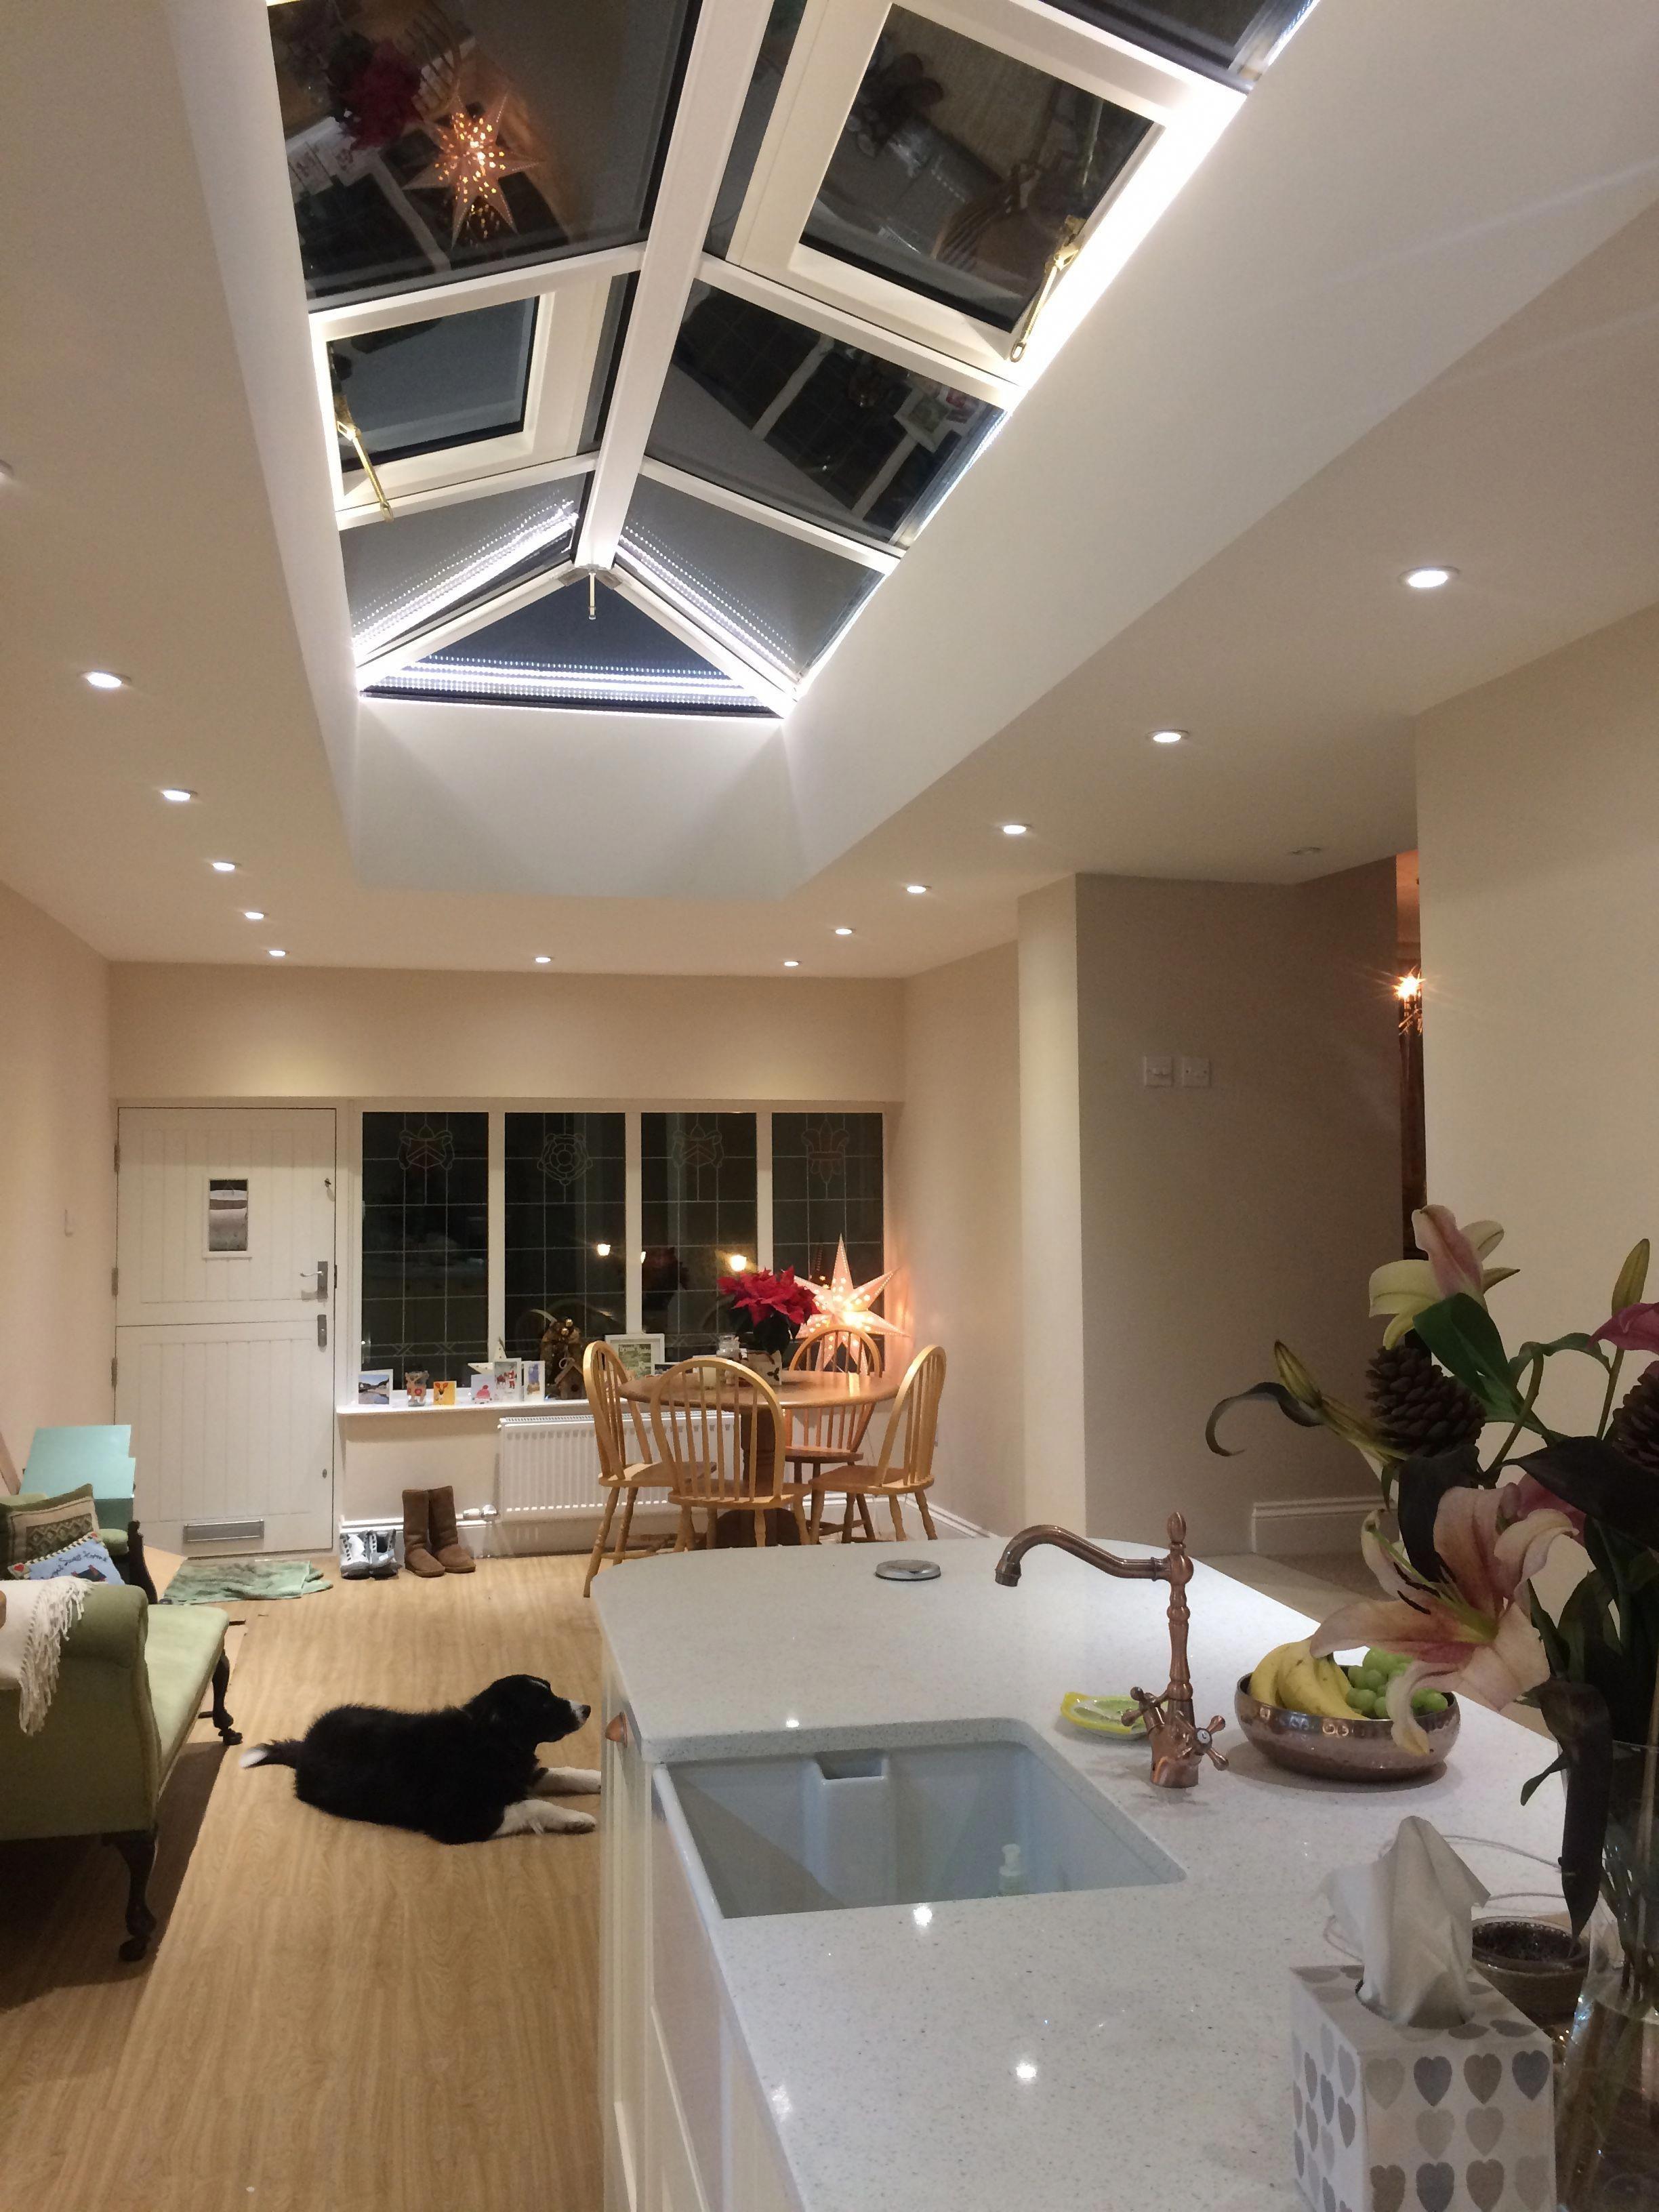 Room Lighting Design Software: Home Decorating Tips And Tricks #InteriorLedLights